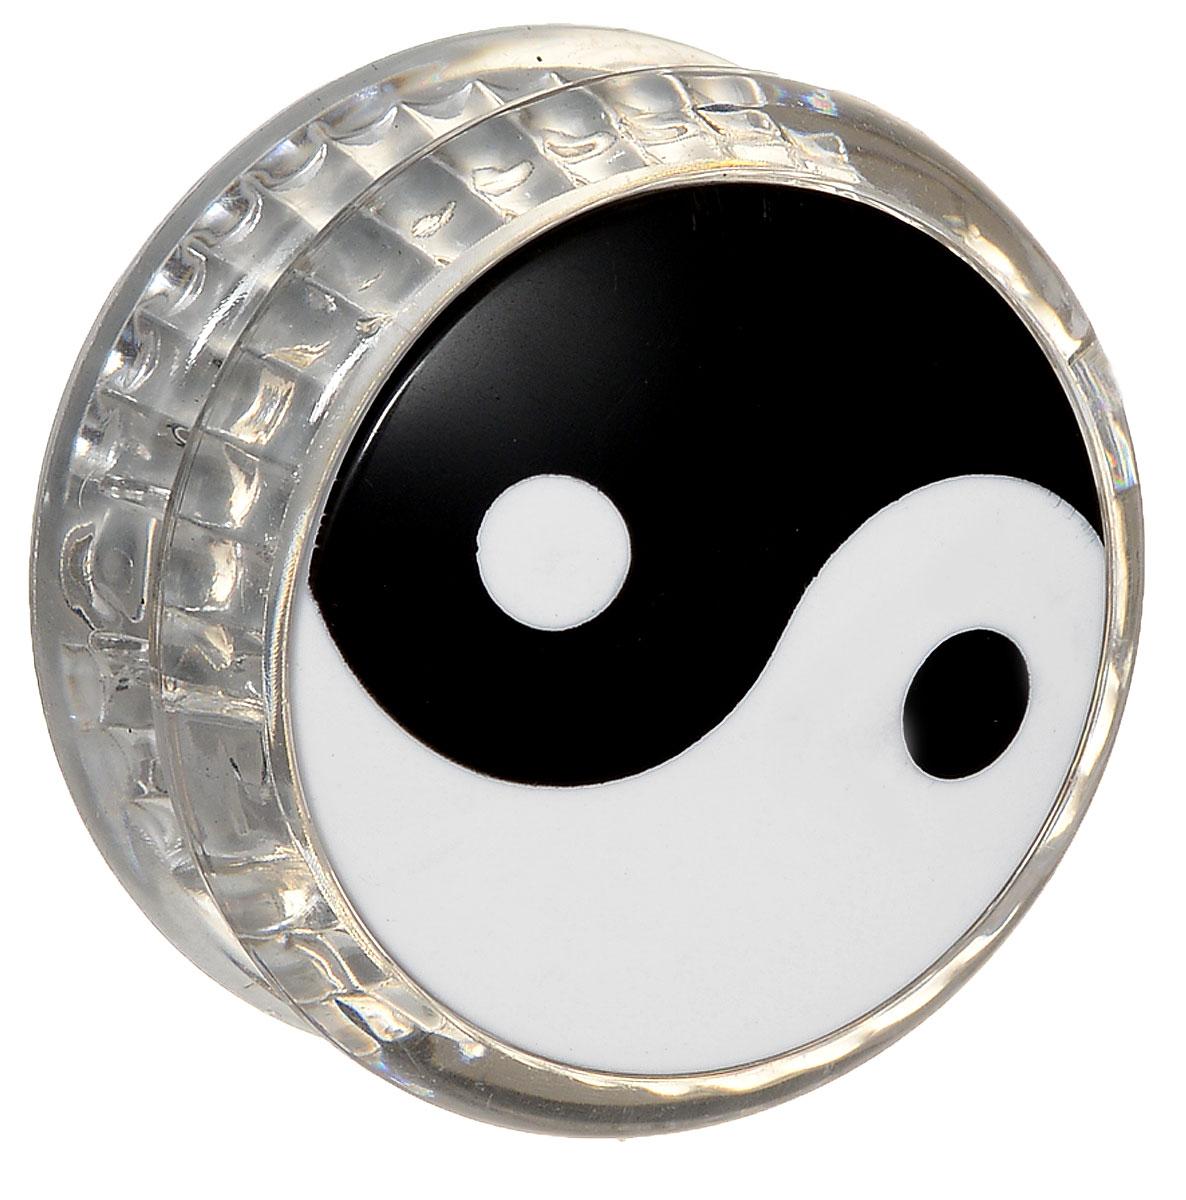 Эврика Йо-йо Инь-Ян цвет прозрачный эврика йо йо инь ян цвет прозрачный